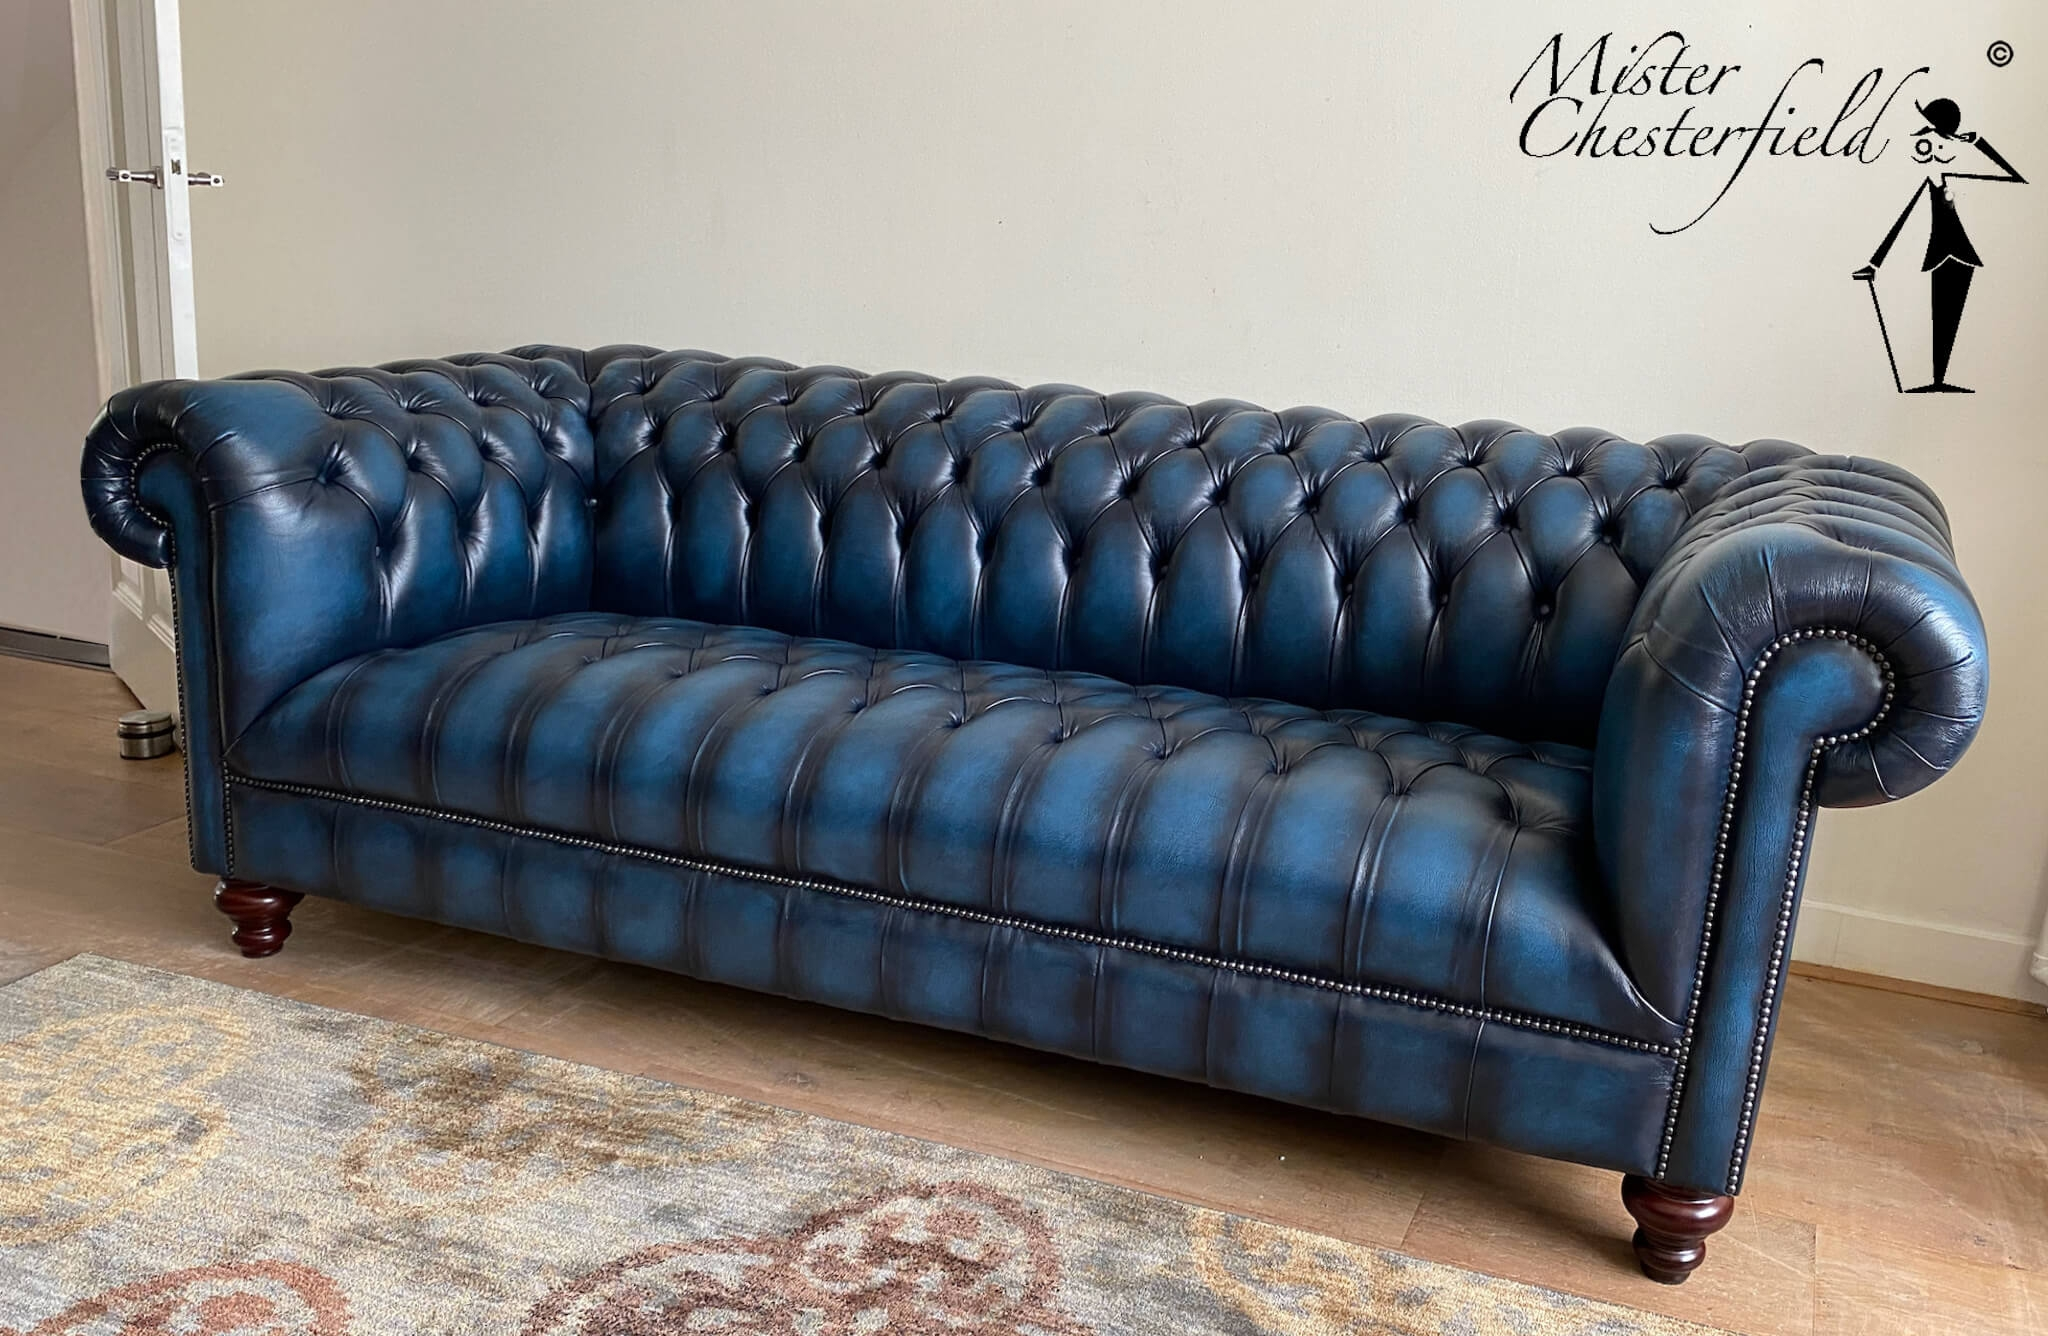 fotoboek-chesterfield-kingston-Forrest-blue-coal-sprung-seat